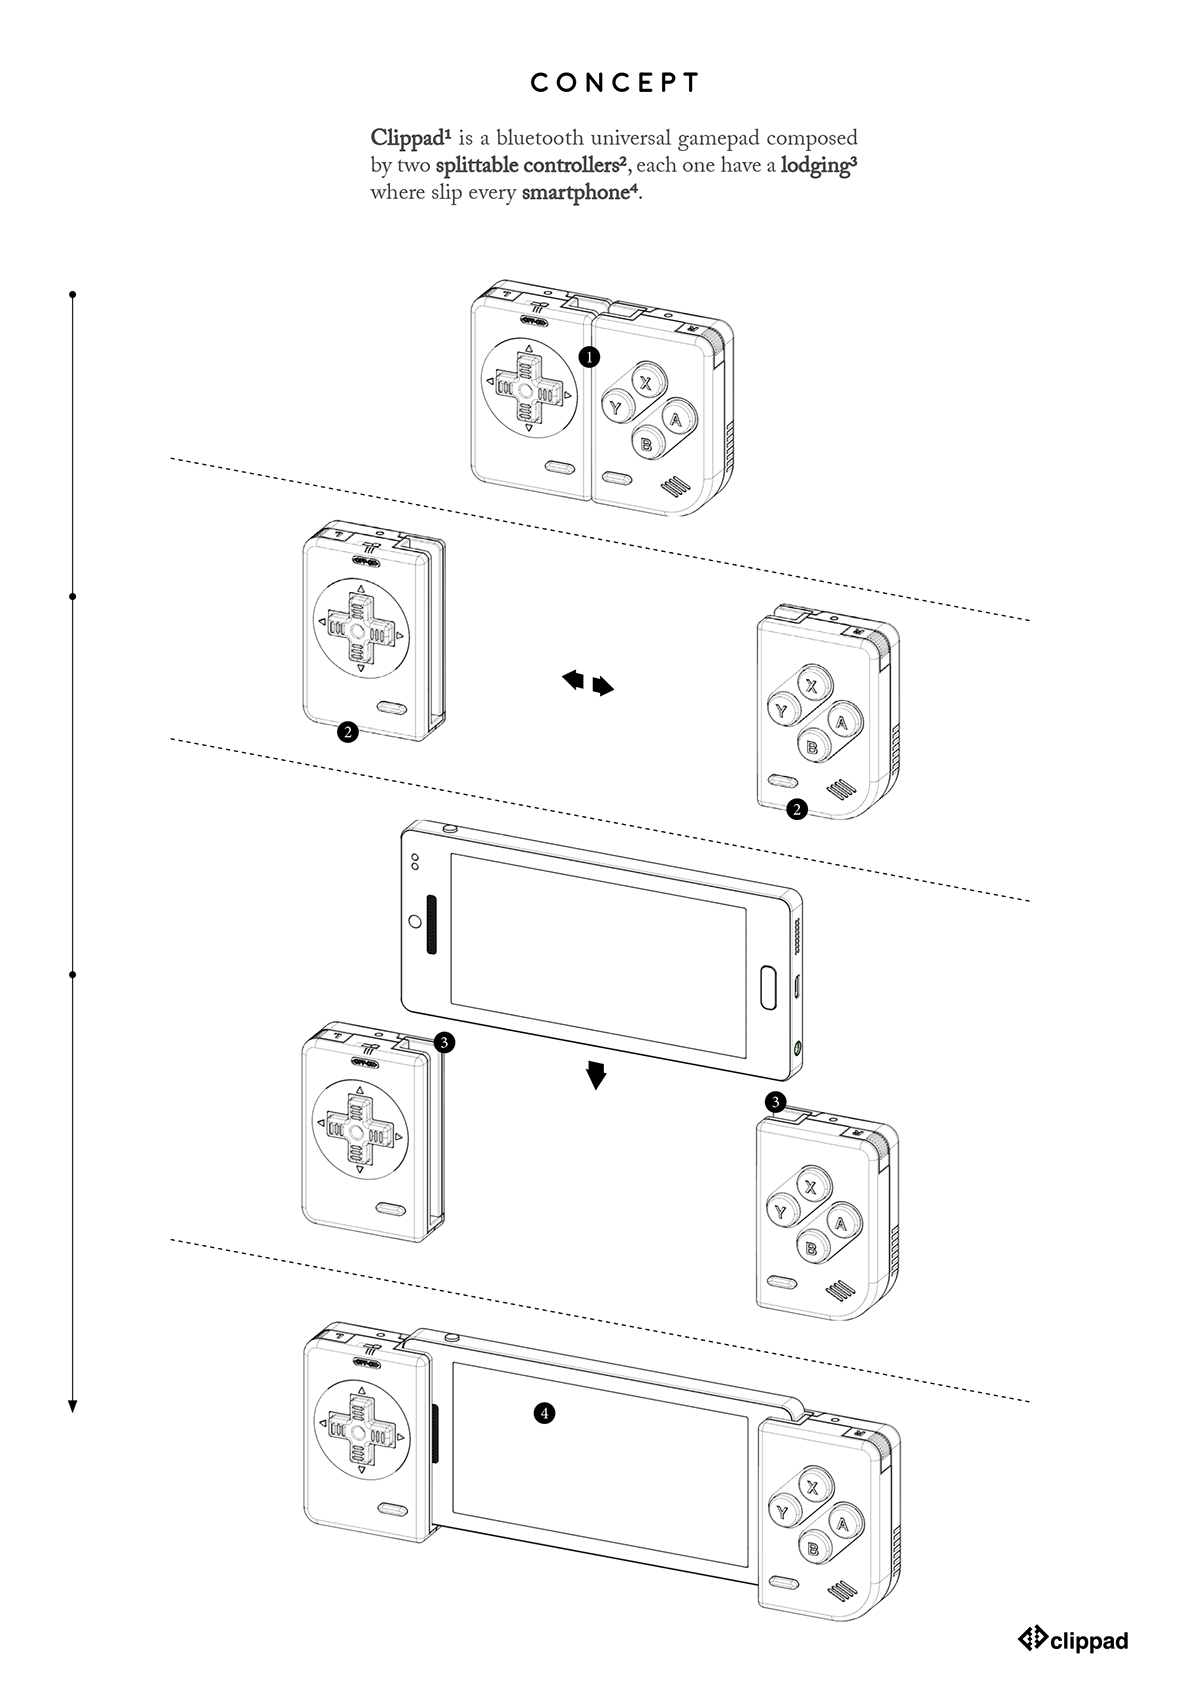 Industrial Design for Clippad Universal Gamepad